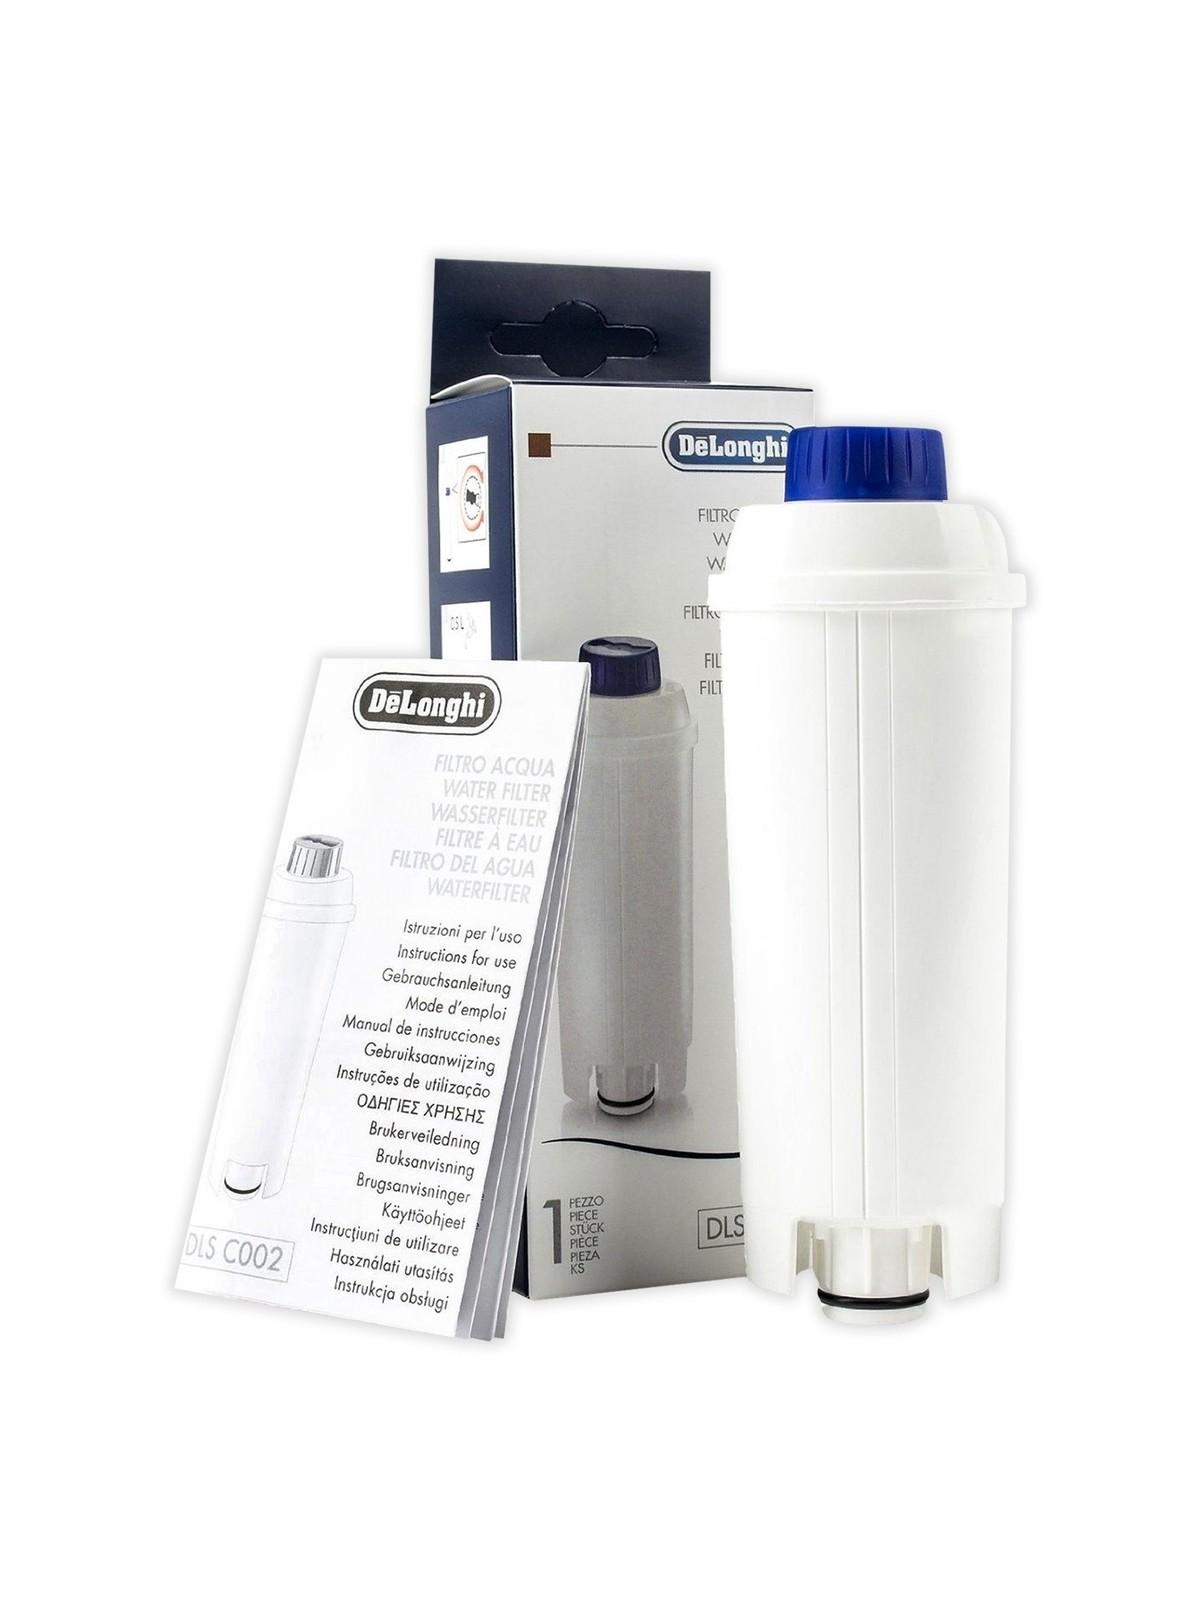 DELONGHI ECAM Waterfilter